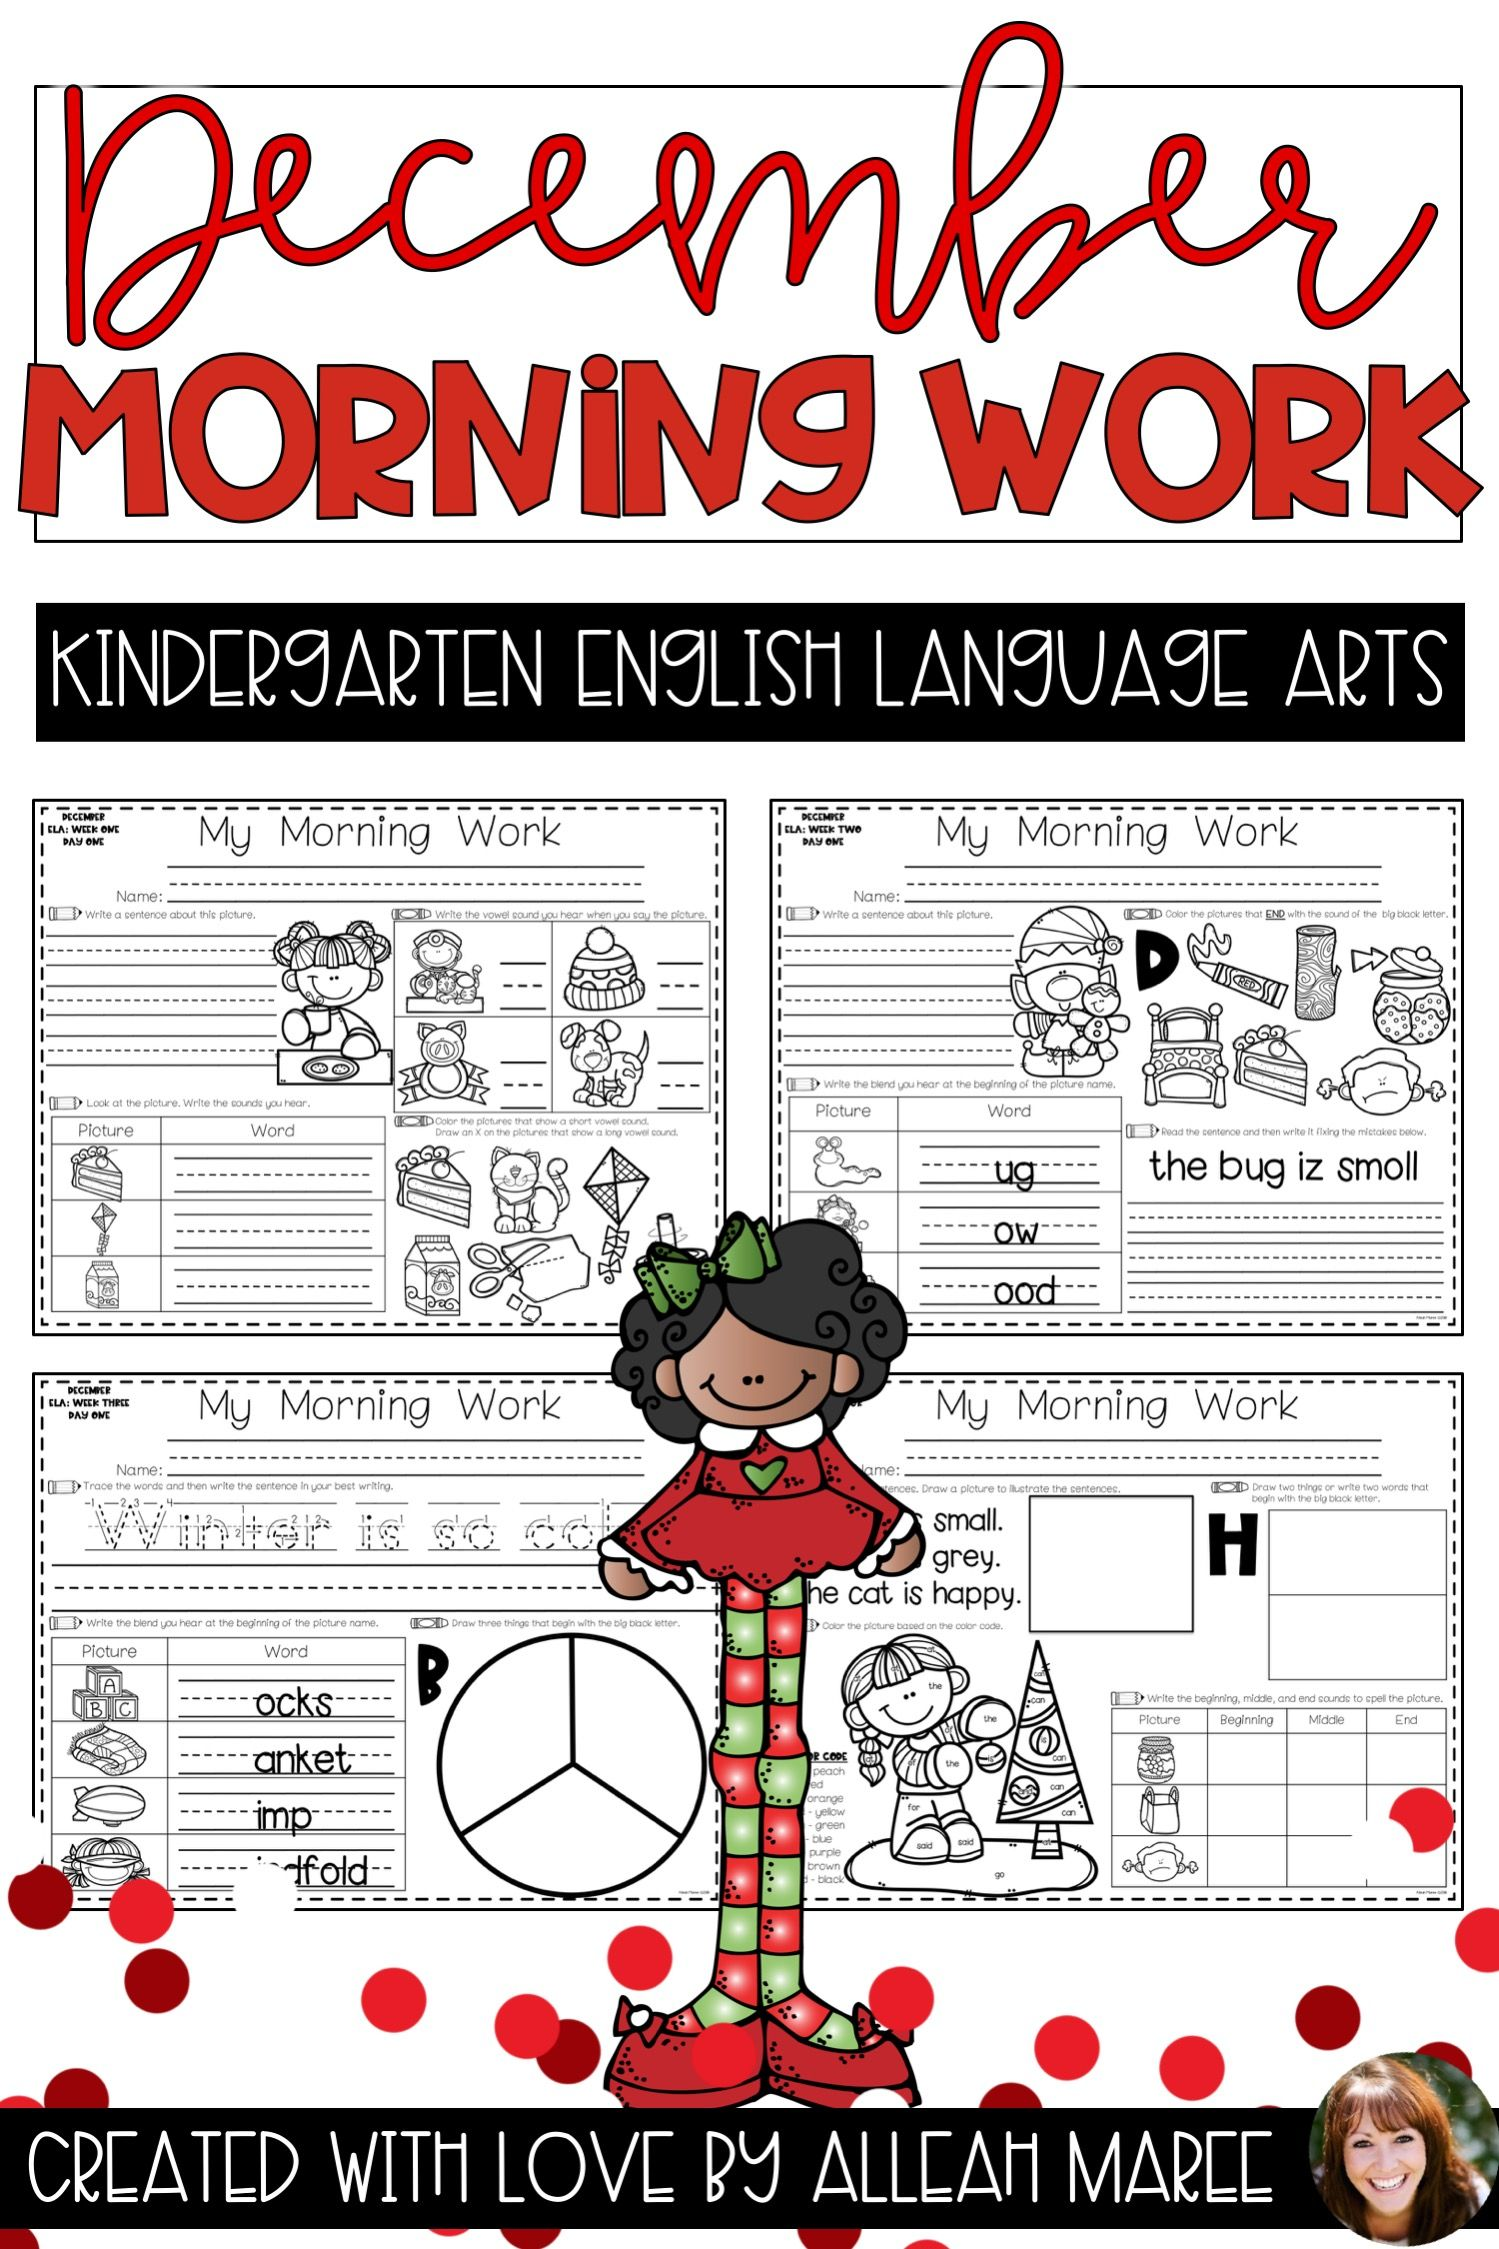 Kindergarten Morning Work Literacy Worksheets And